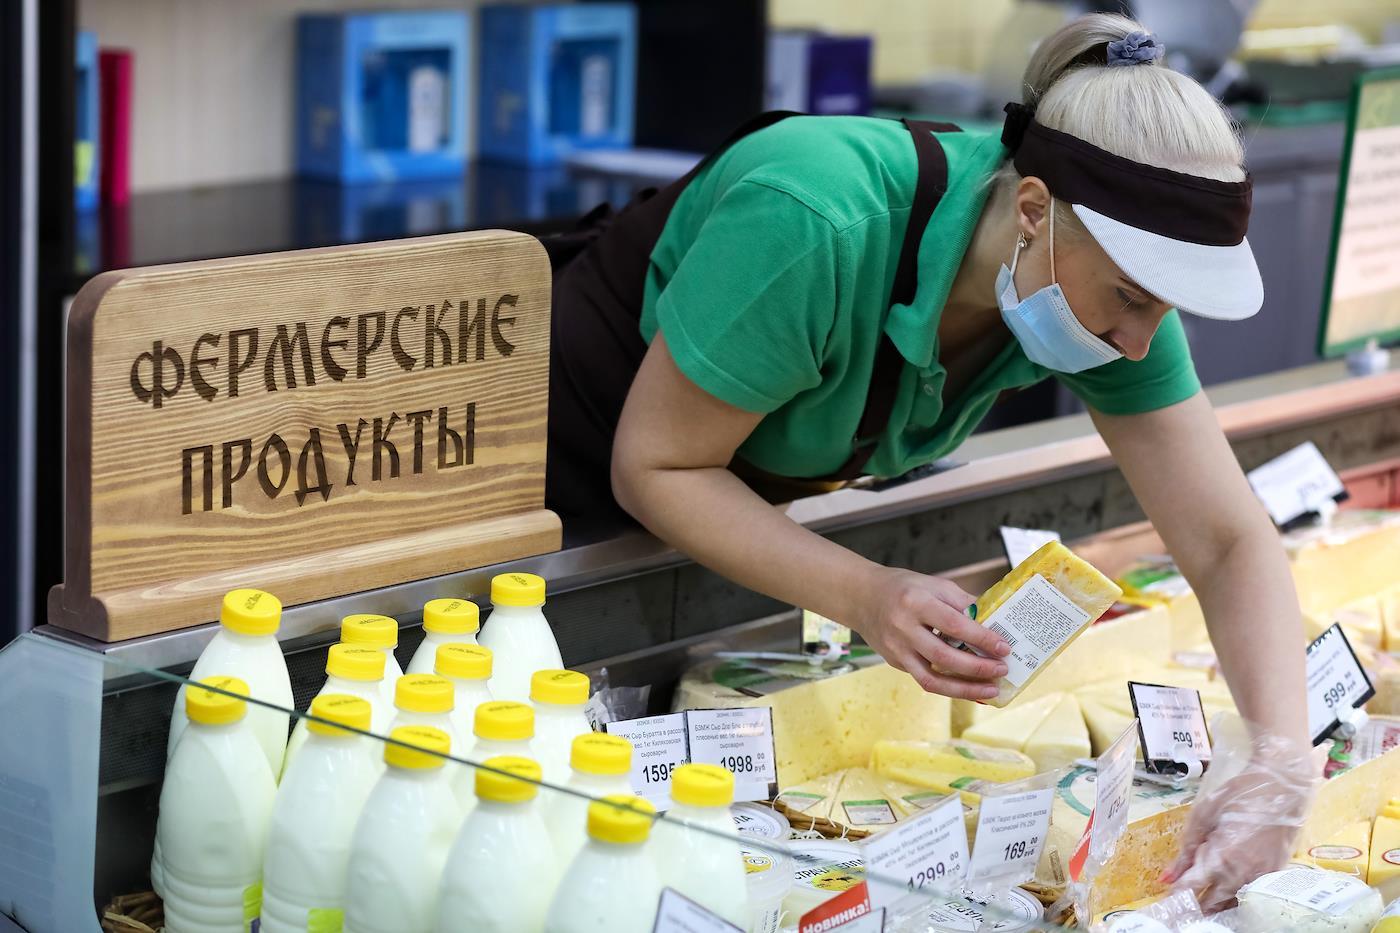 автор фотоАртем Краснов/Коммерсантъ